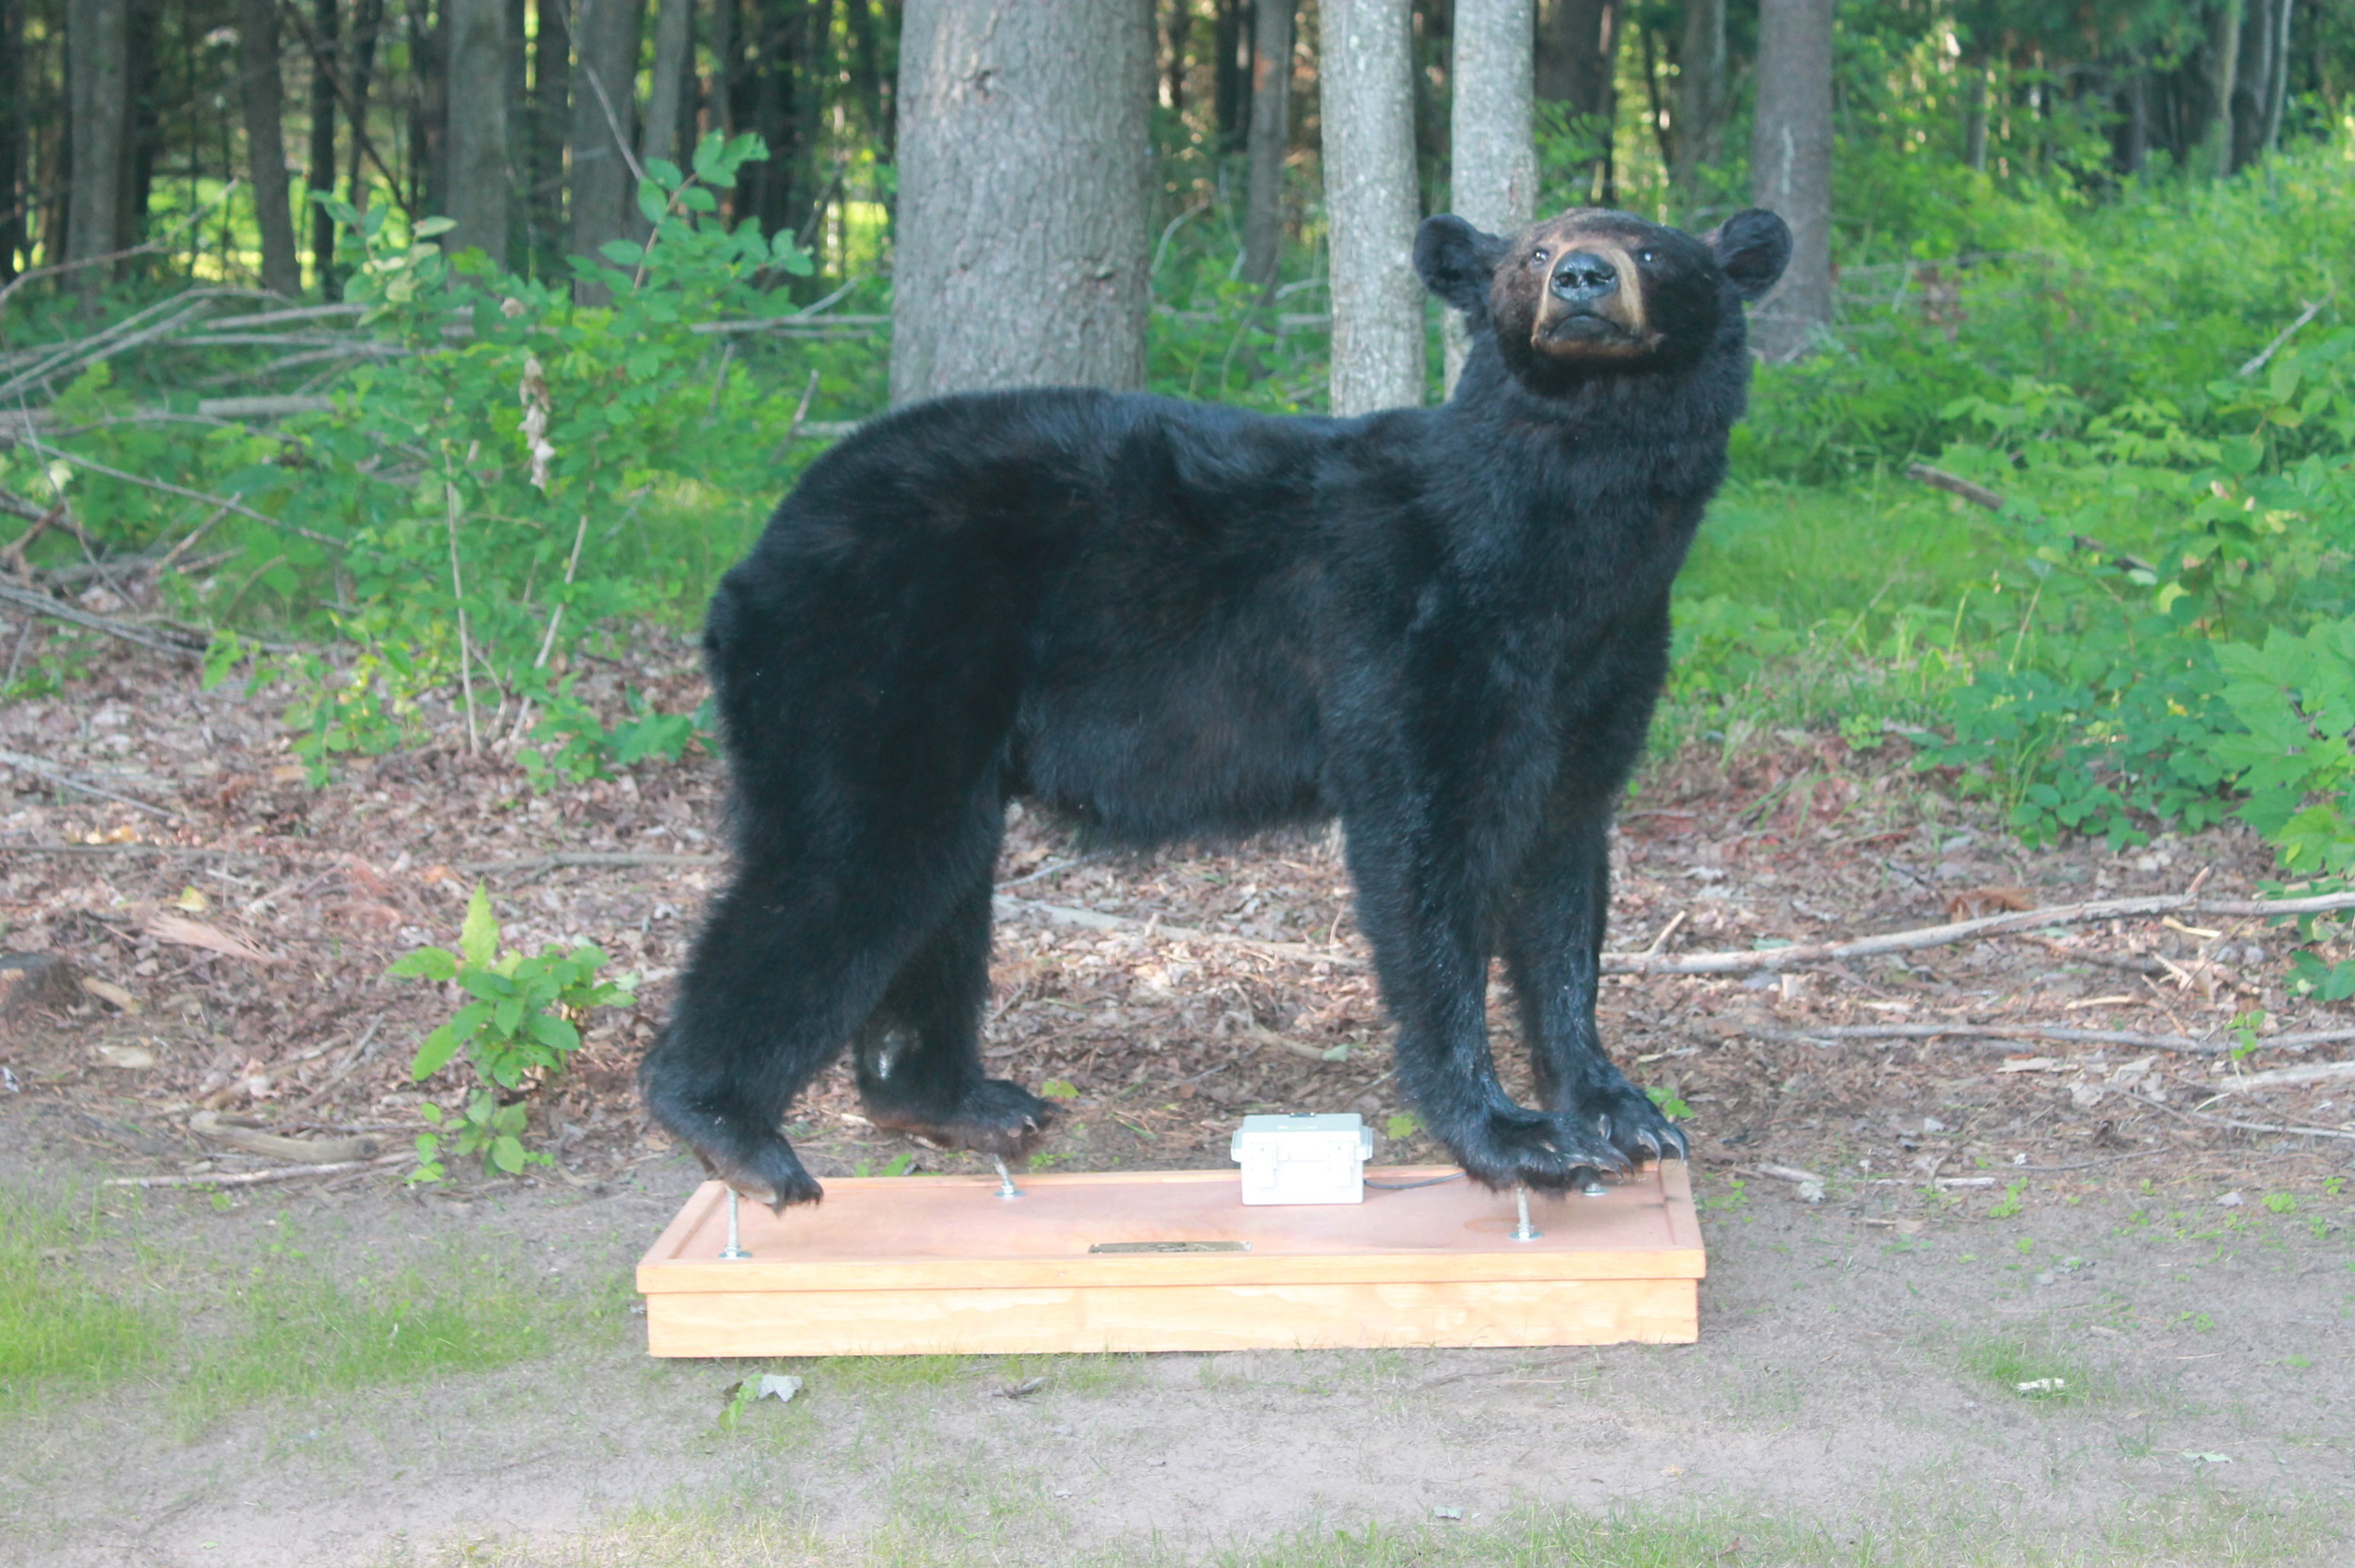 image of large bear walking through field for Robotic Decoy bear mount